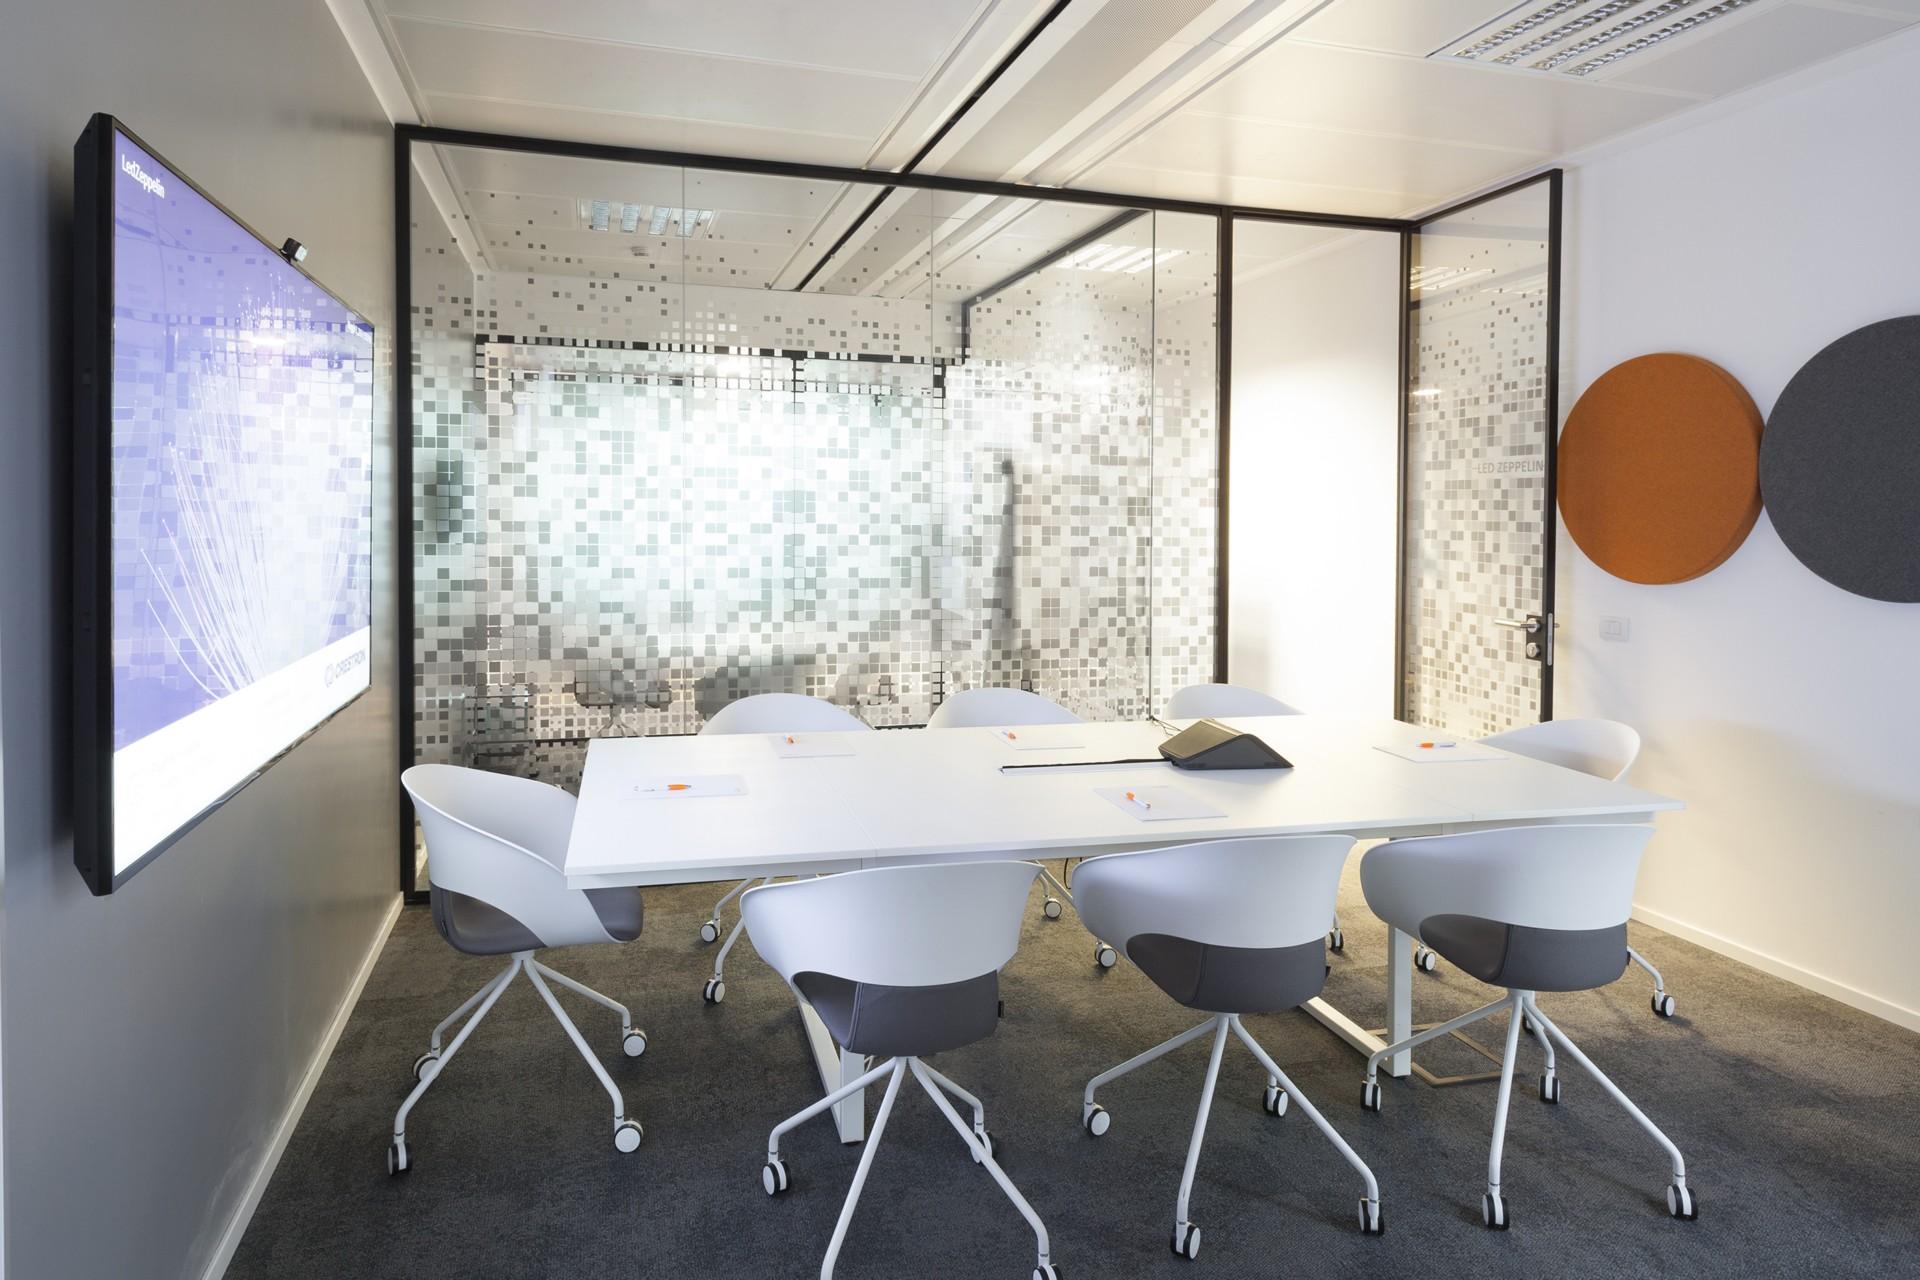 Progetto cmr u2013 massimo roj architects bureaux modernes a; milan